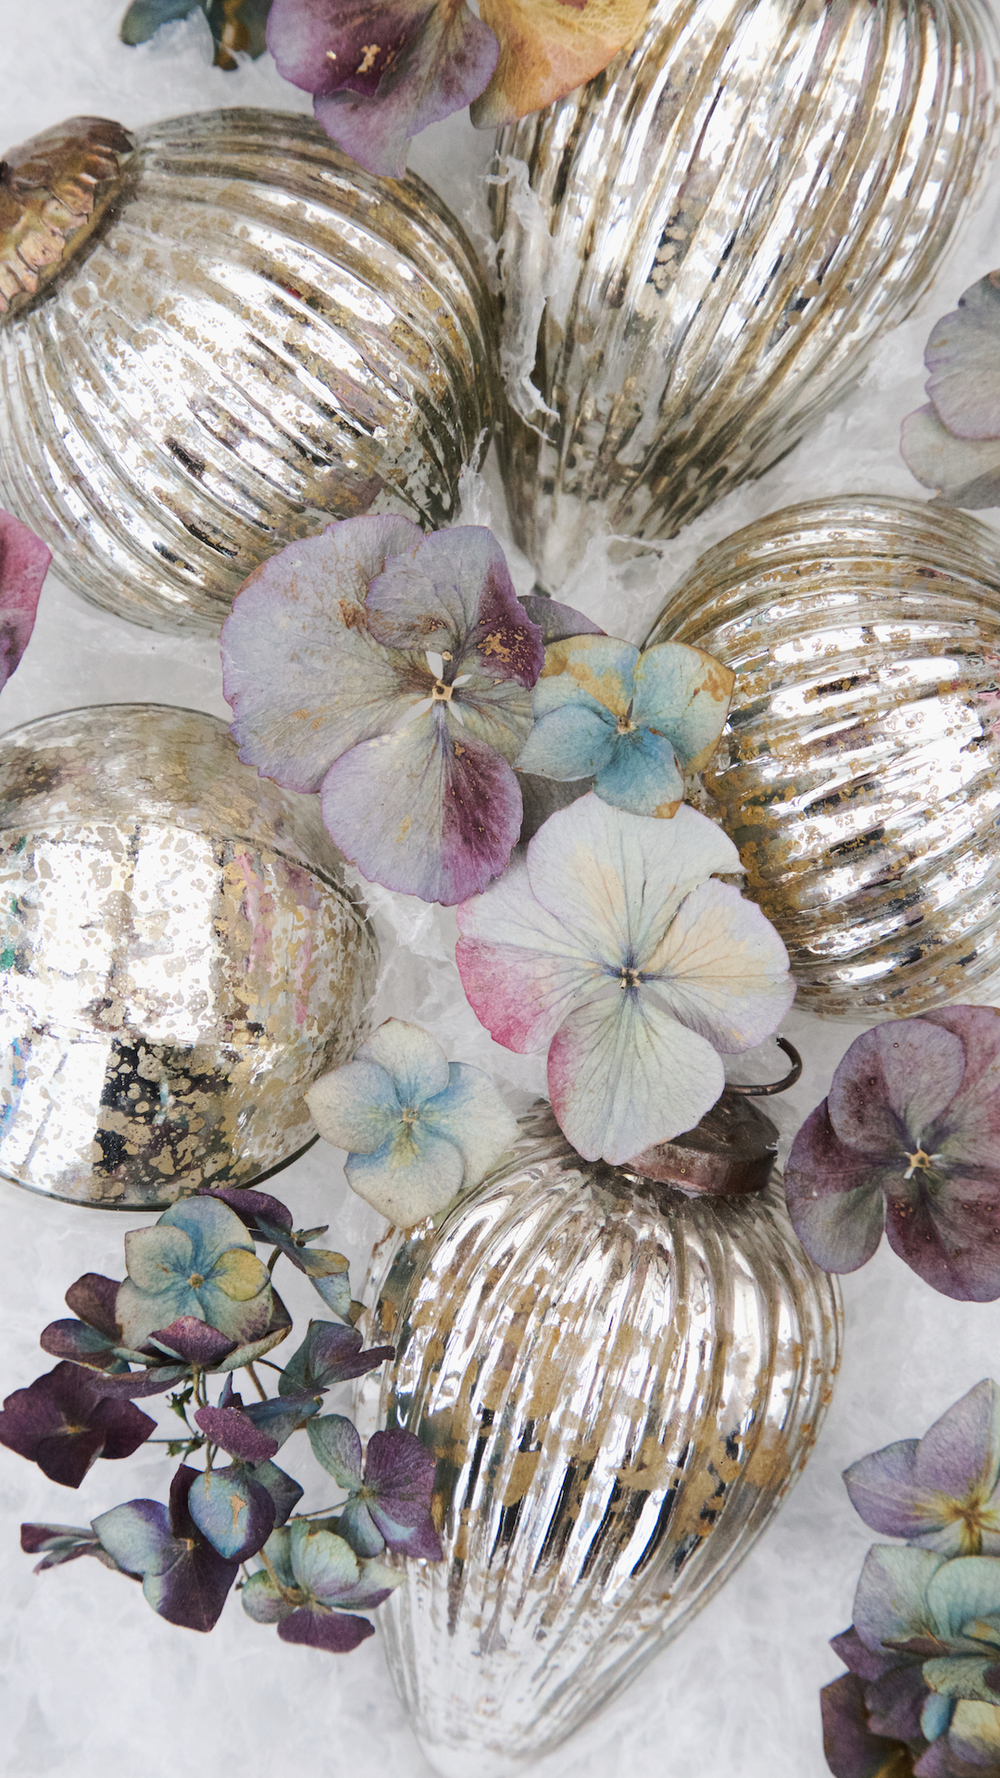 free winter floral wallpapers 9.jpg